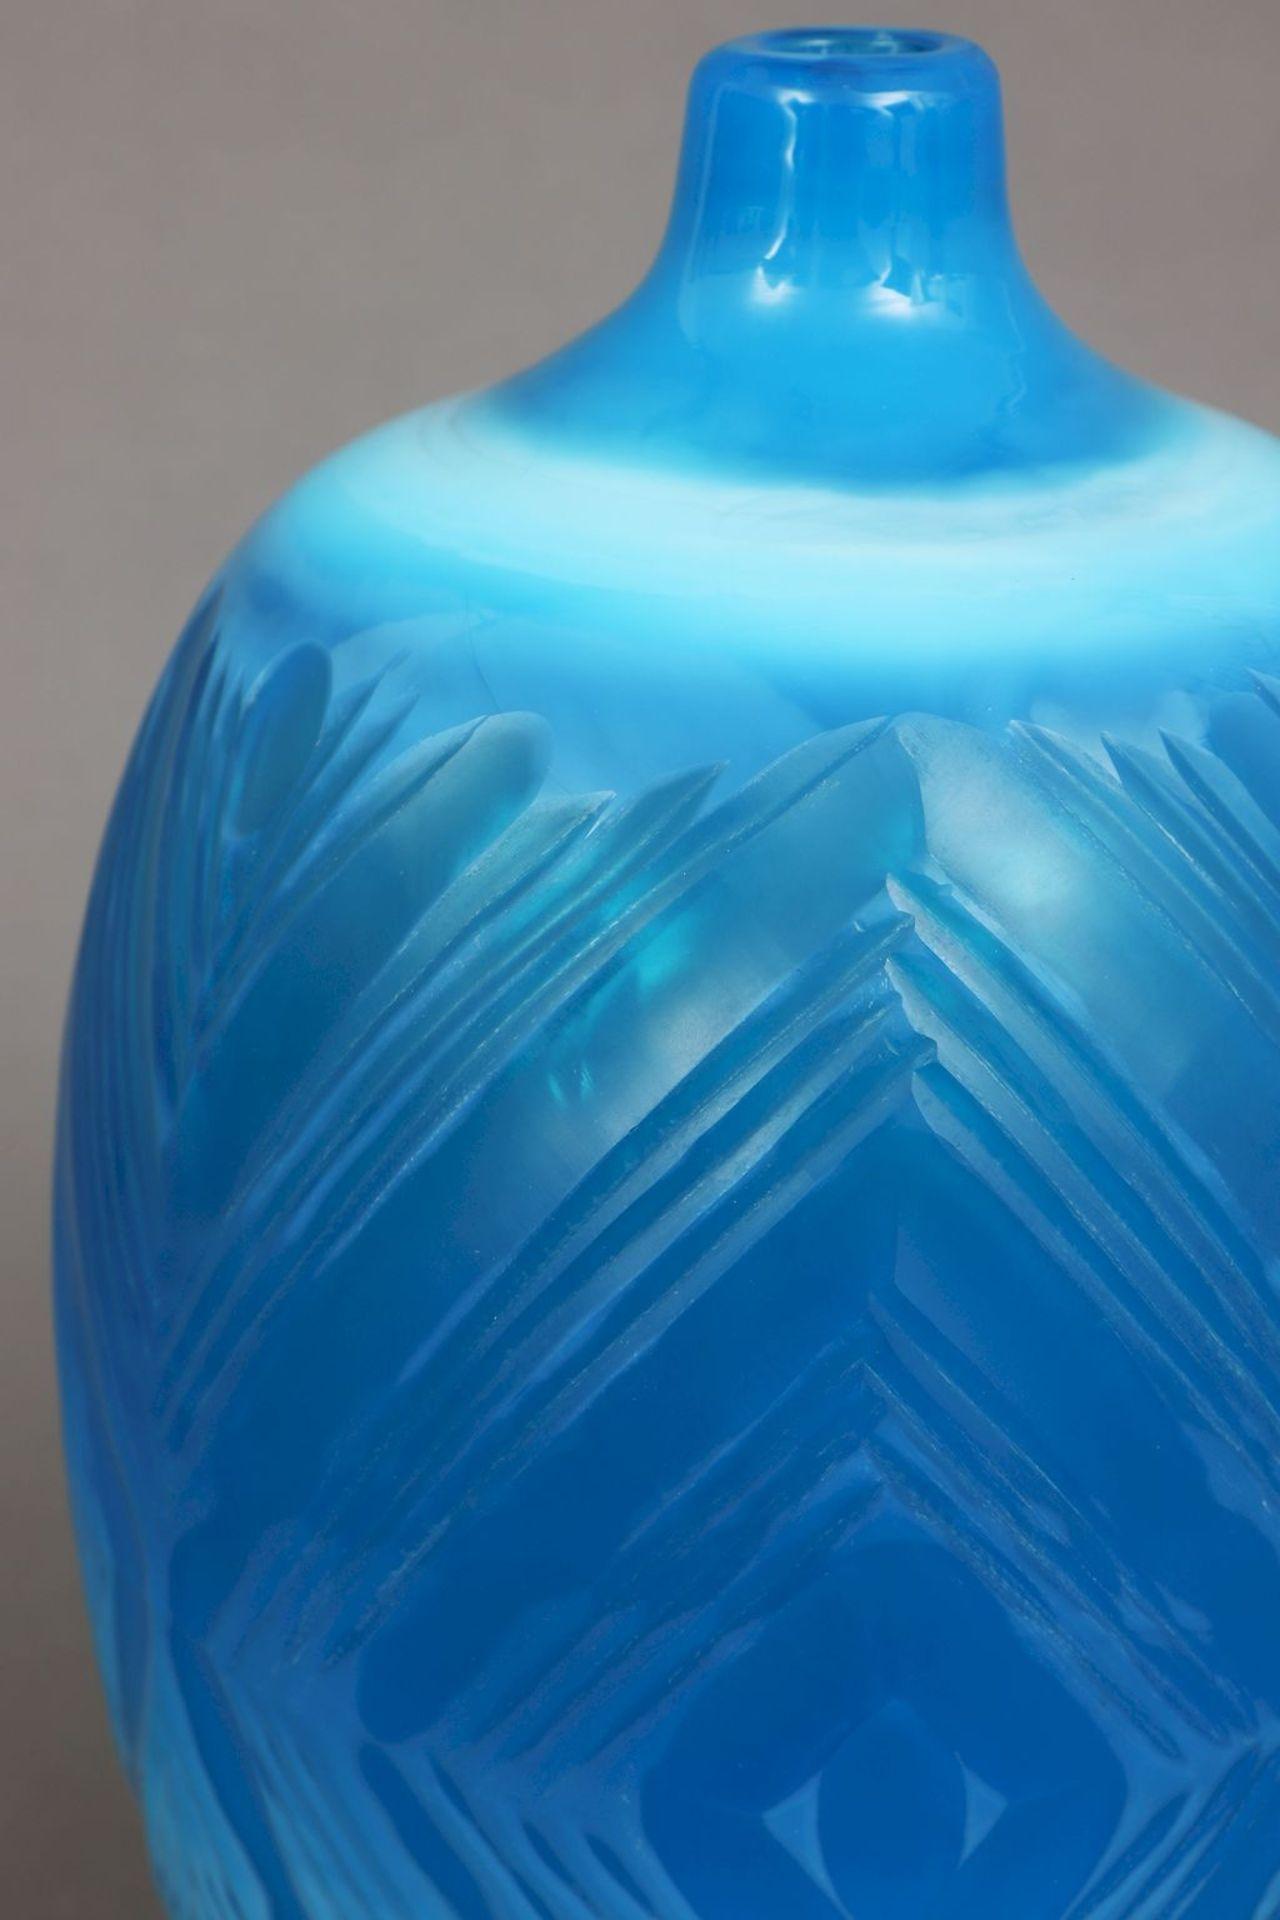 Glasvase - Bild 2 aus 3